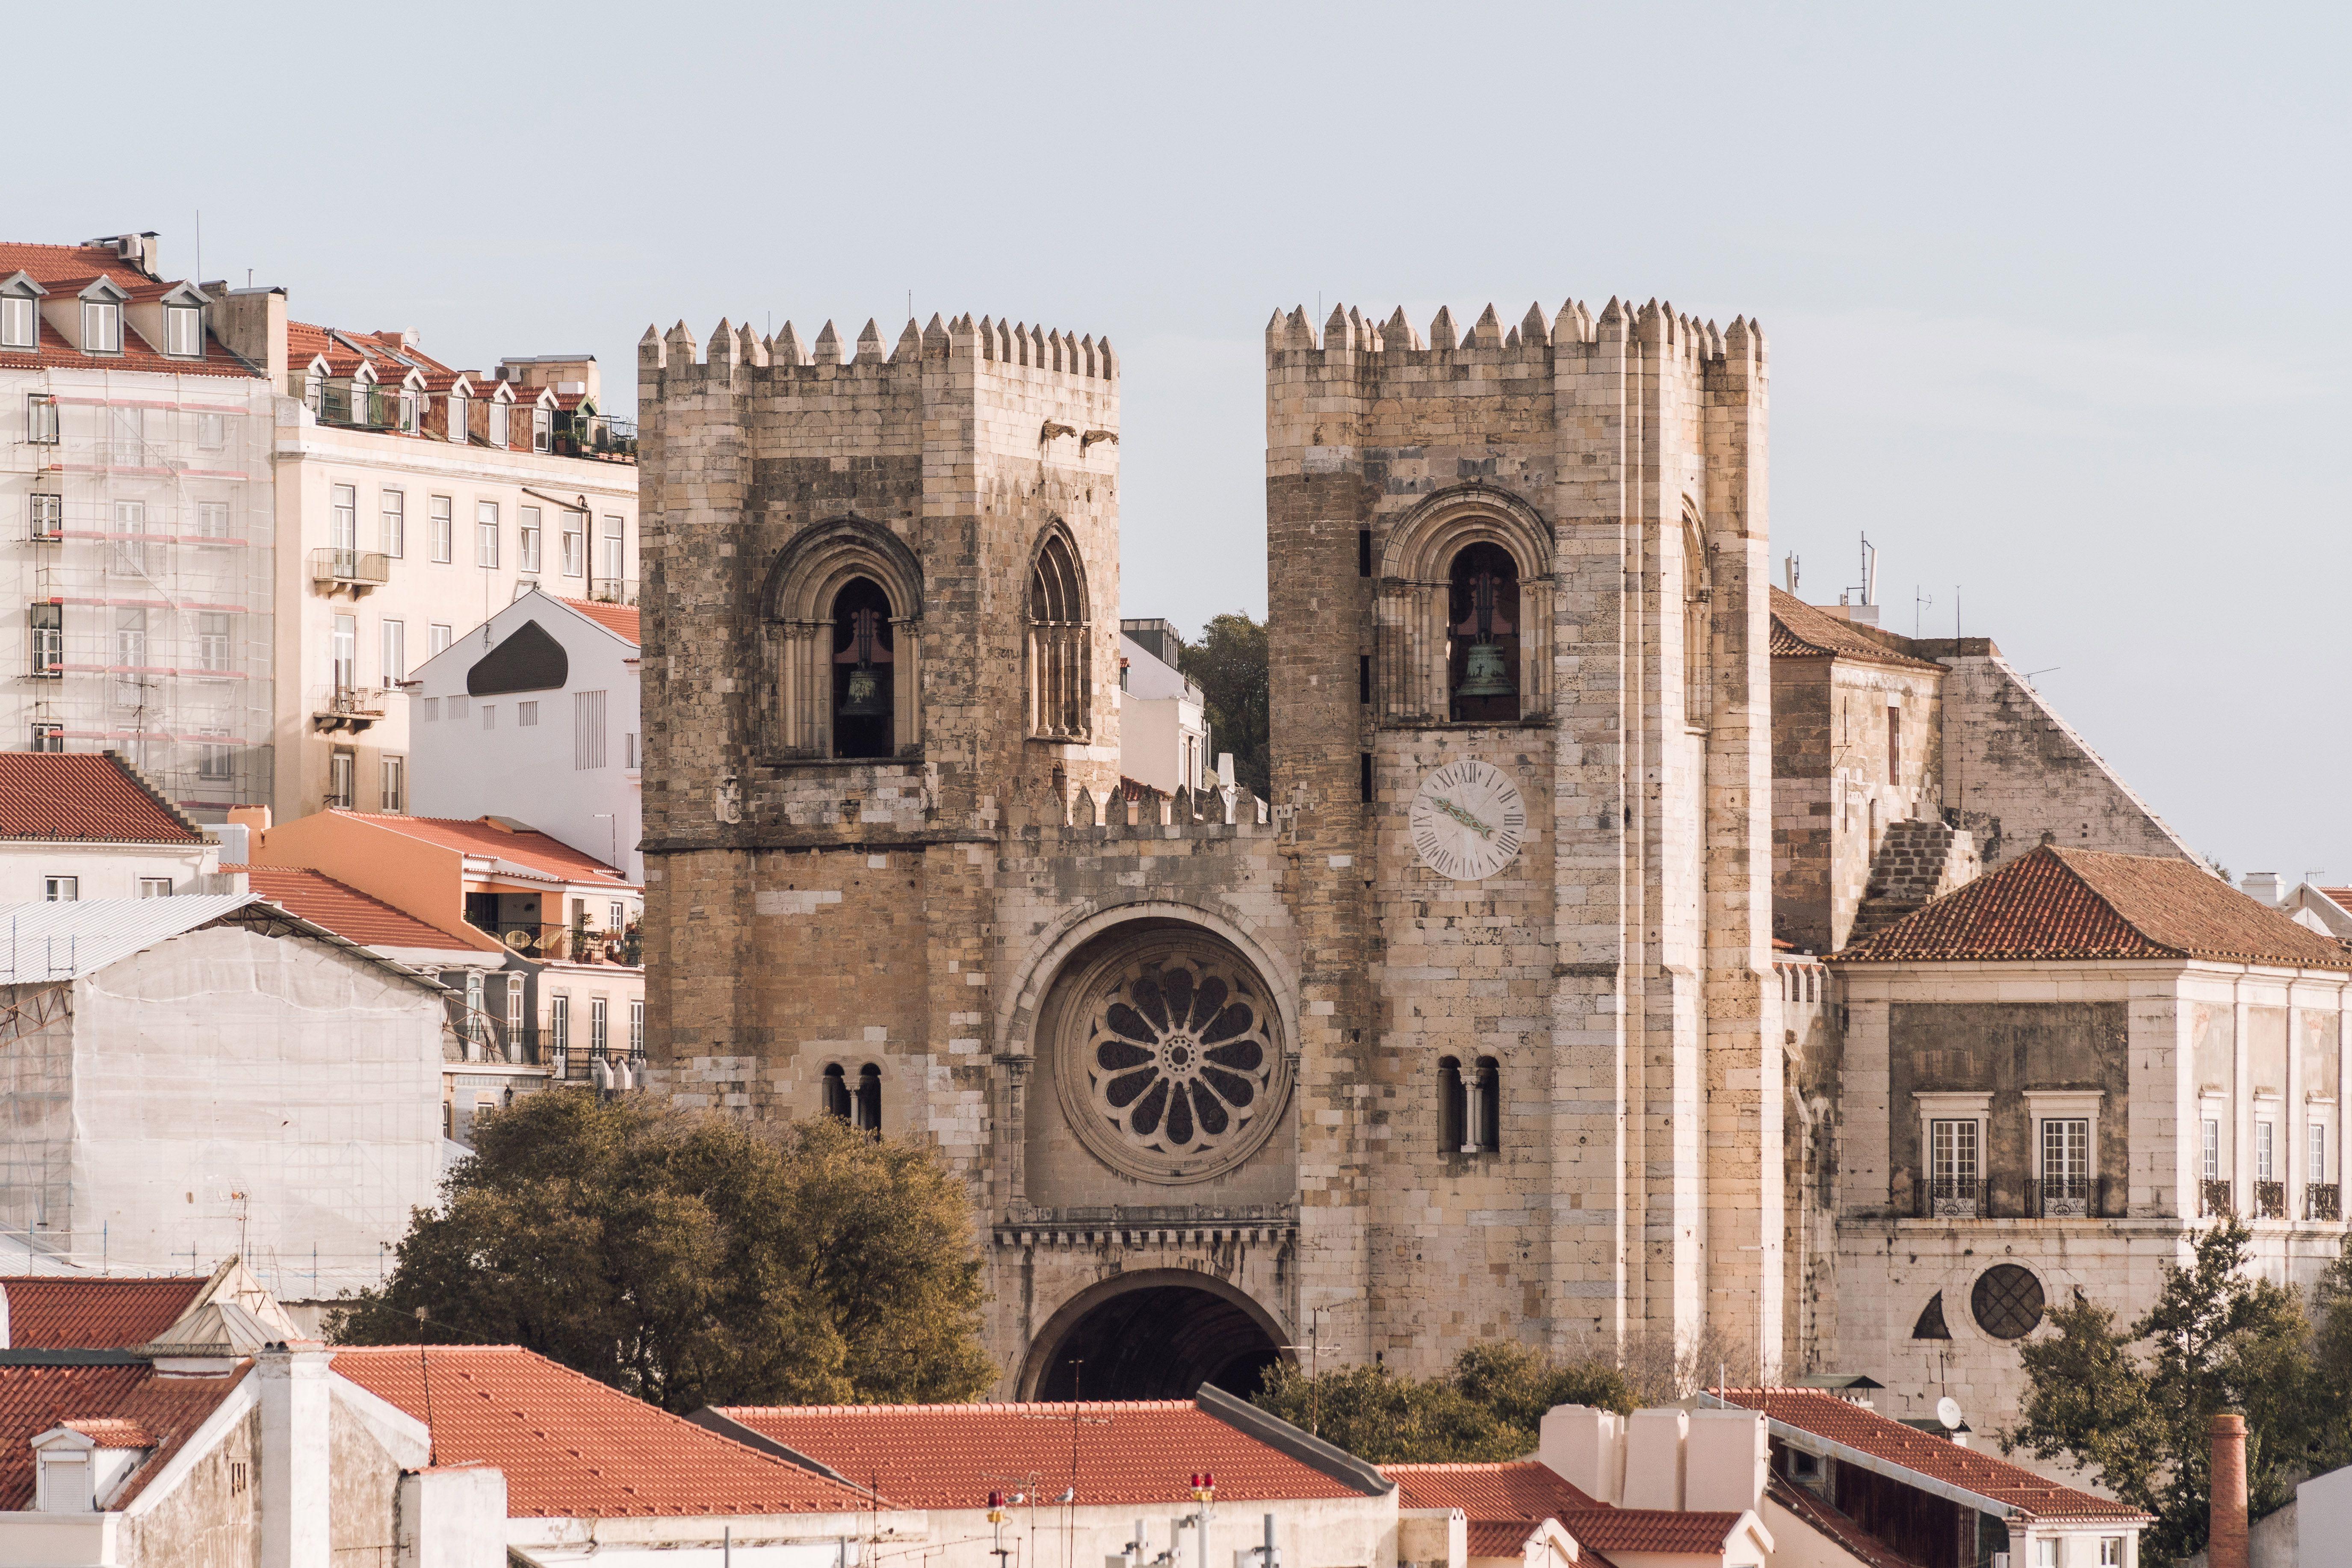 La catedral que sobresale del paisaje urbano